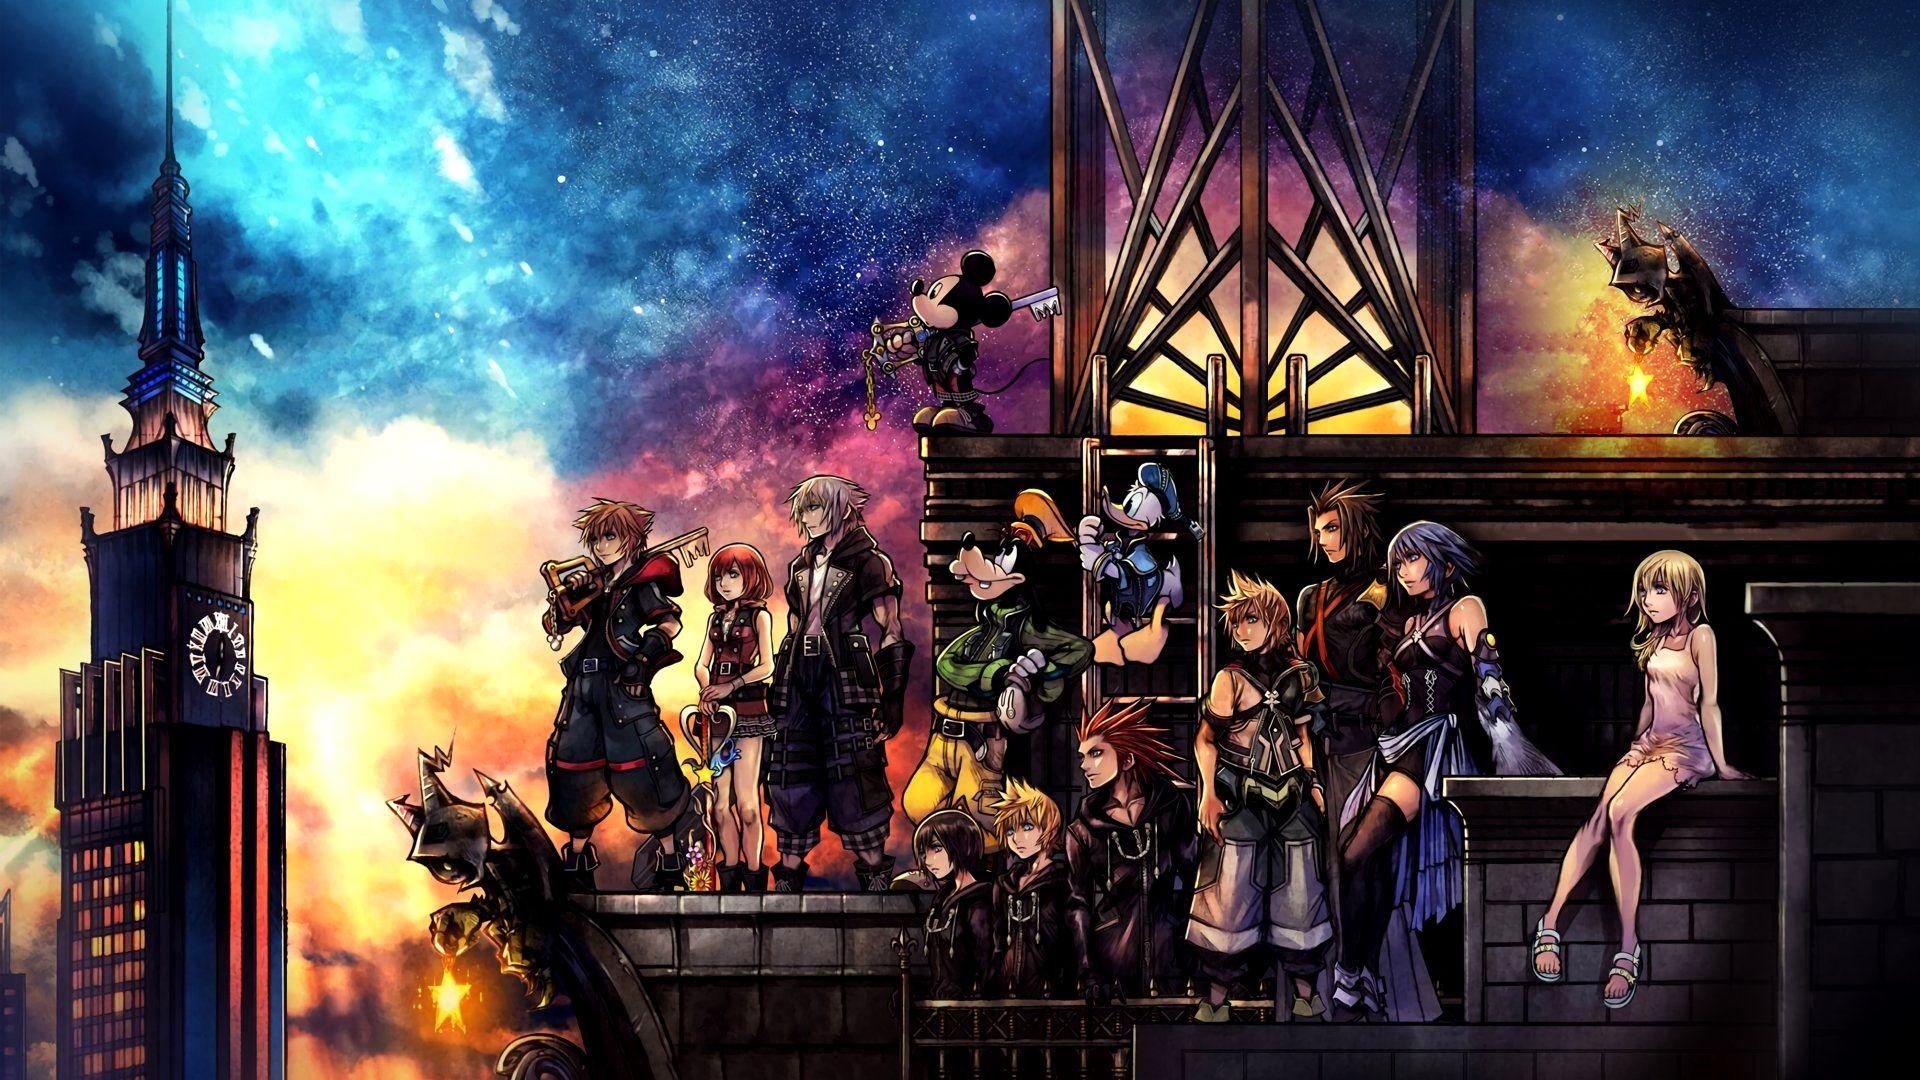 Wallpaper 4k Kingdom Hearts Gallery In 2020 Kingdom Hearts Wallpaper Kingdom Hearts Terra Kingdom Hearts